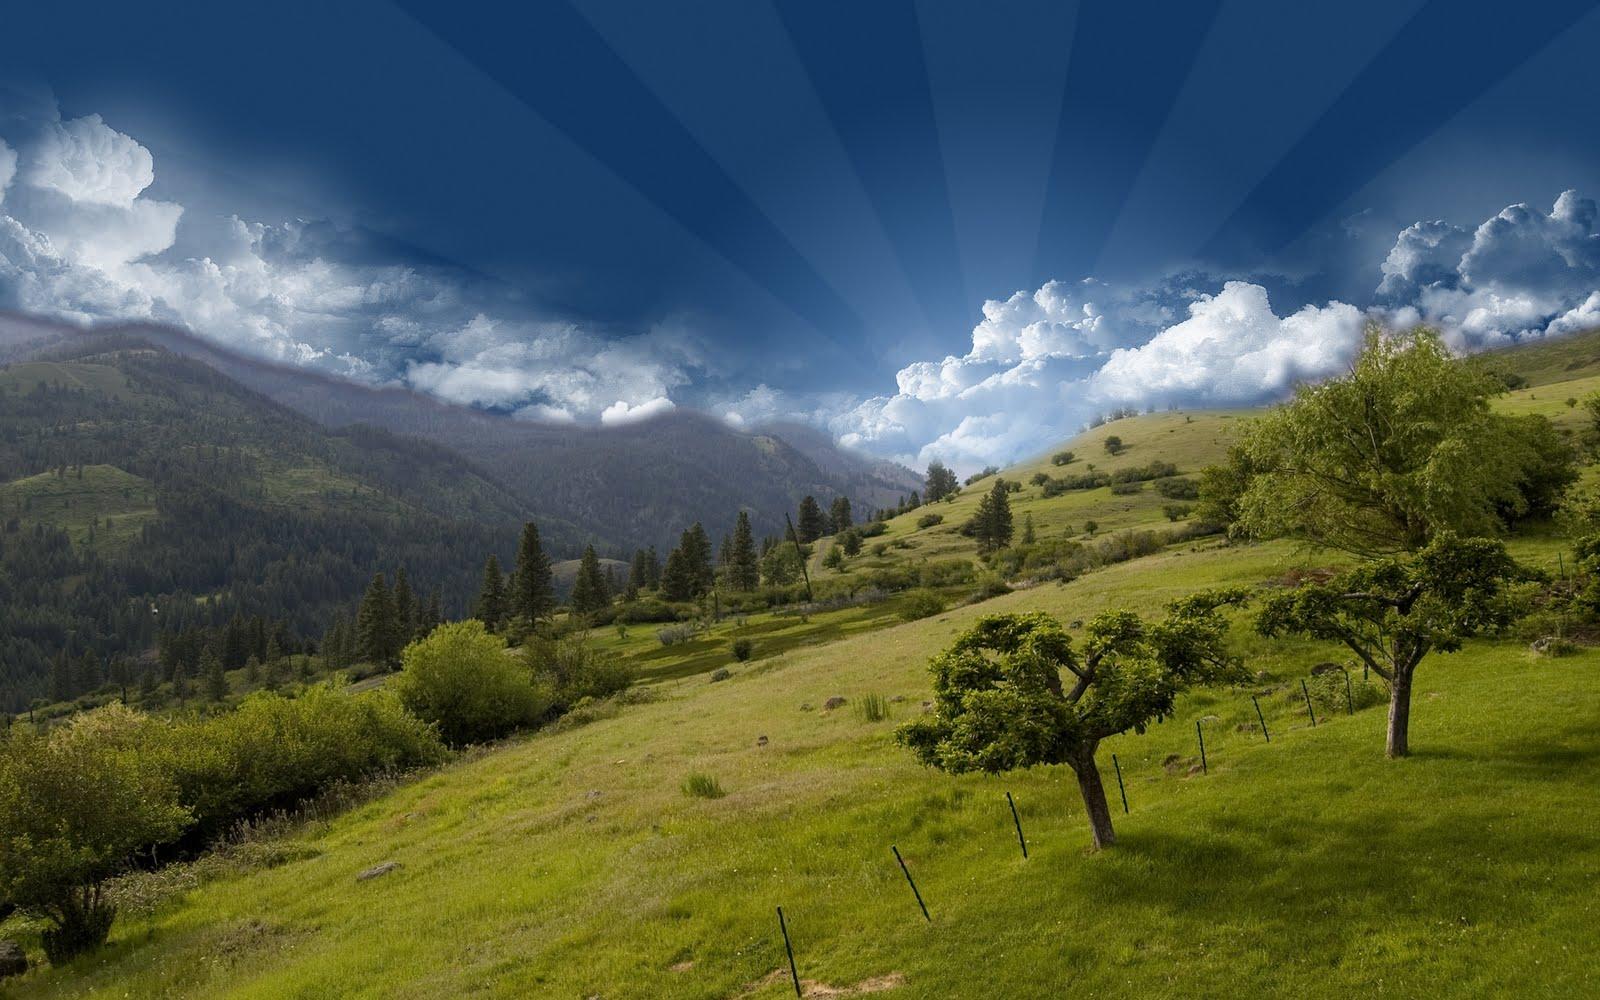 http://2.bp.blogspot.com/-3nsIyI6wVzk/TmsypmzykcI/AAAAAAAABqA/qOaICfCaU5A/s1600/hilltop-mountain-skys.jpg